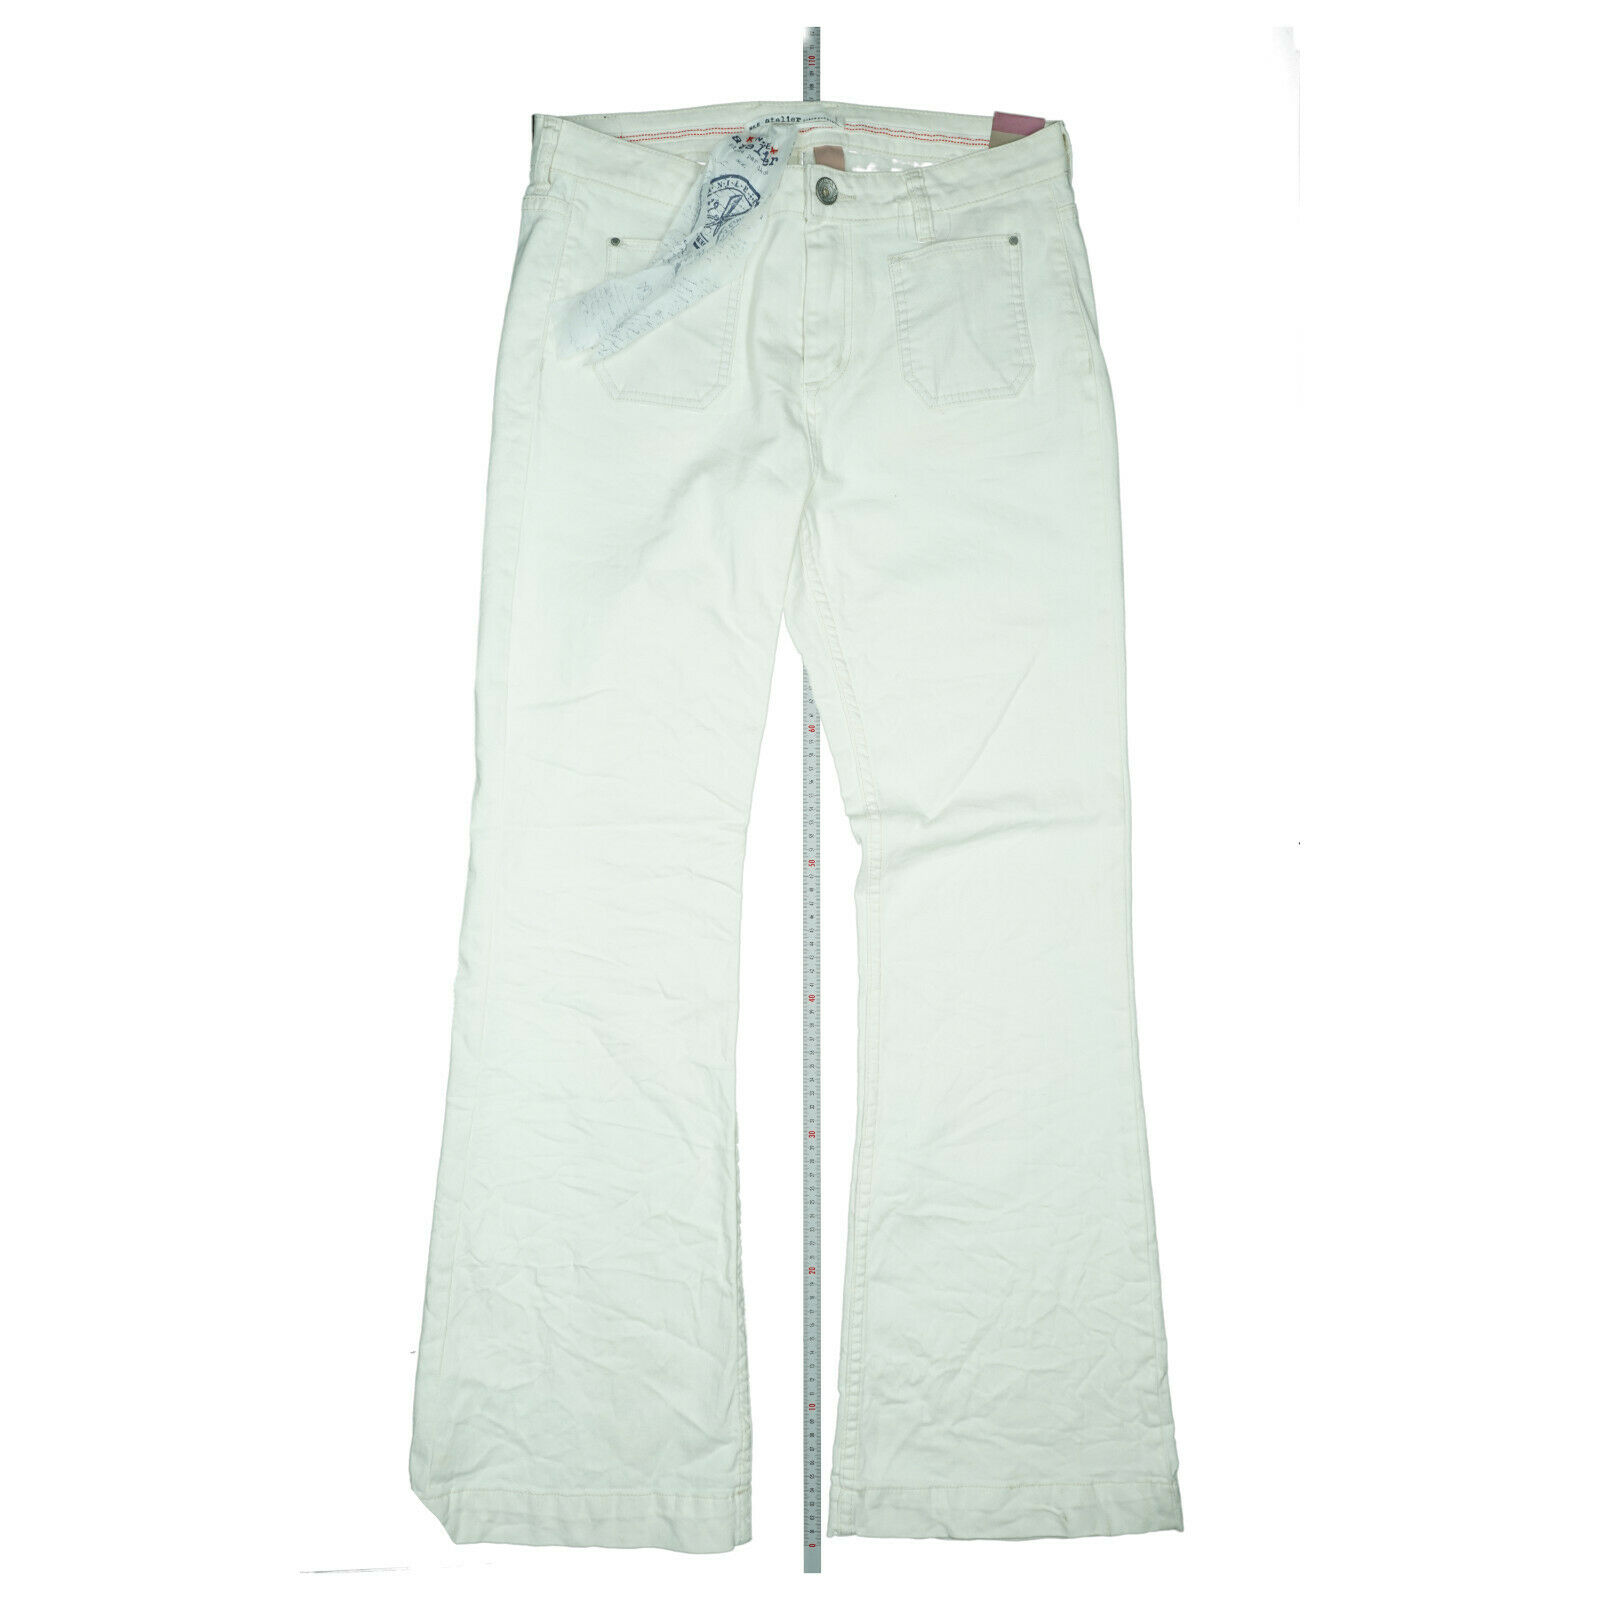 NILE Atelier Damen stretch Bootcut Schlag Flare Jeans Hose L W32 L32 weiß creme